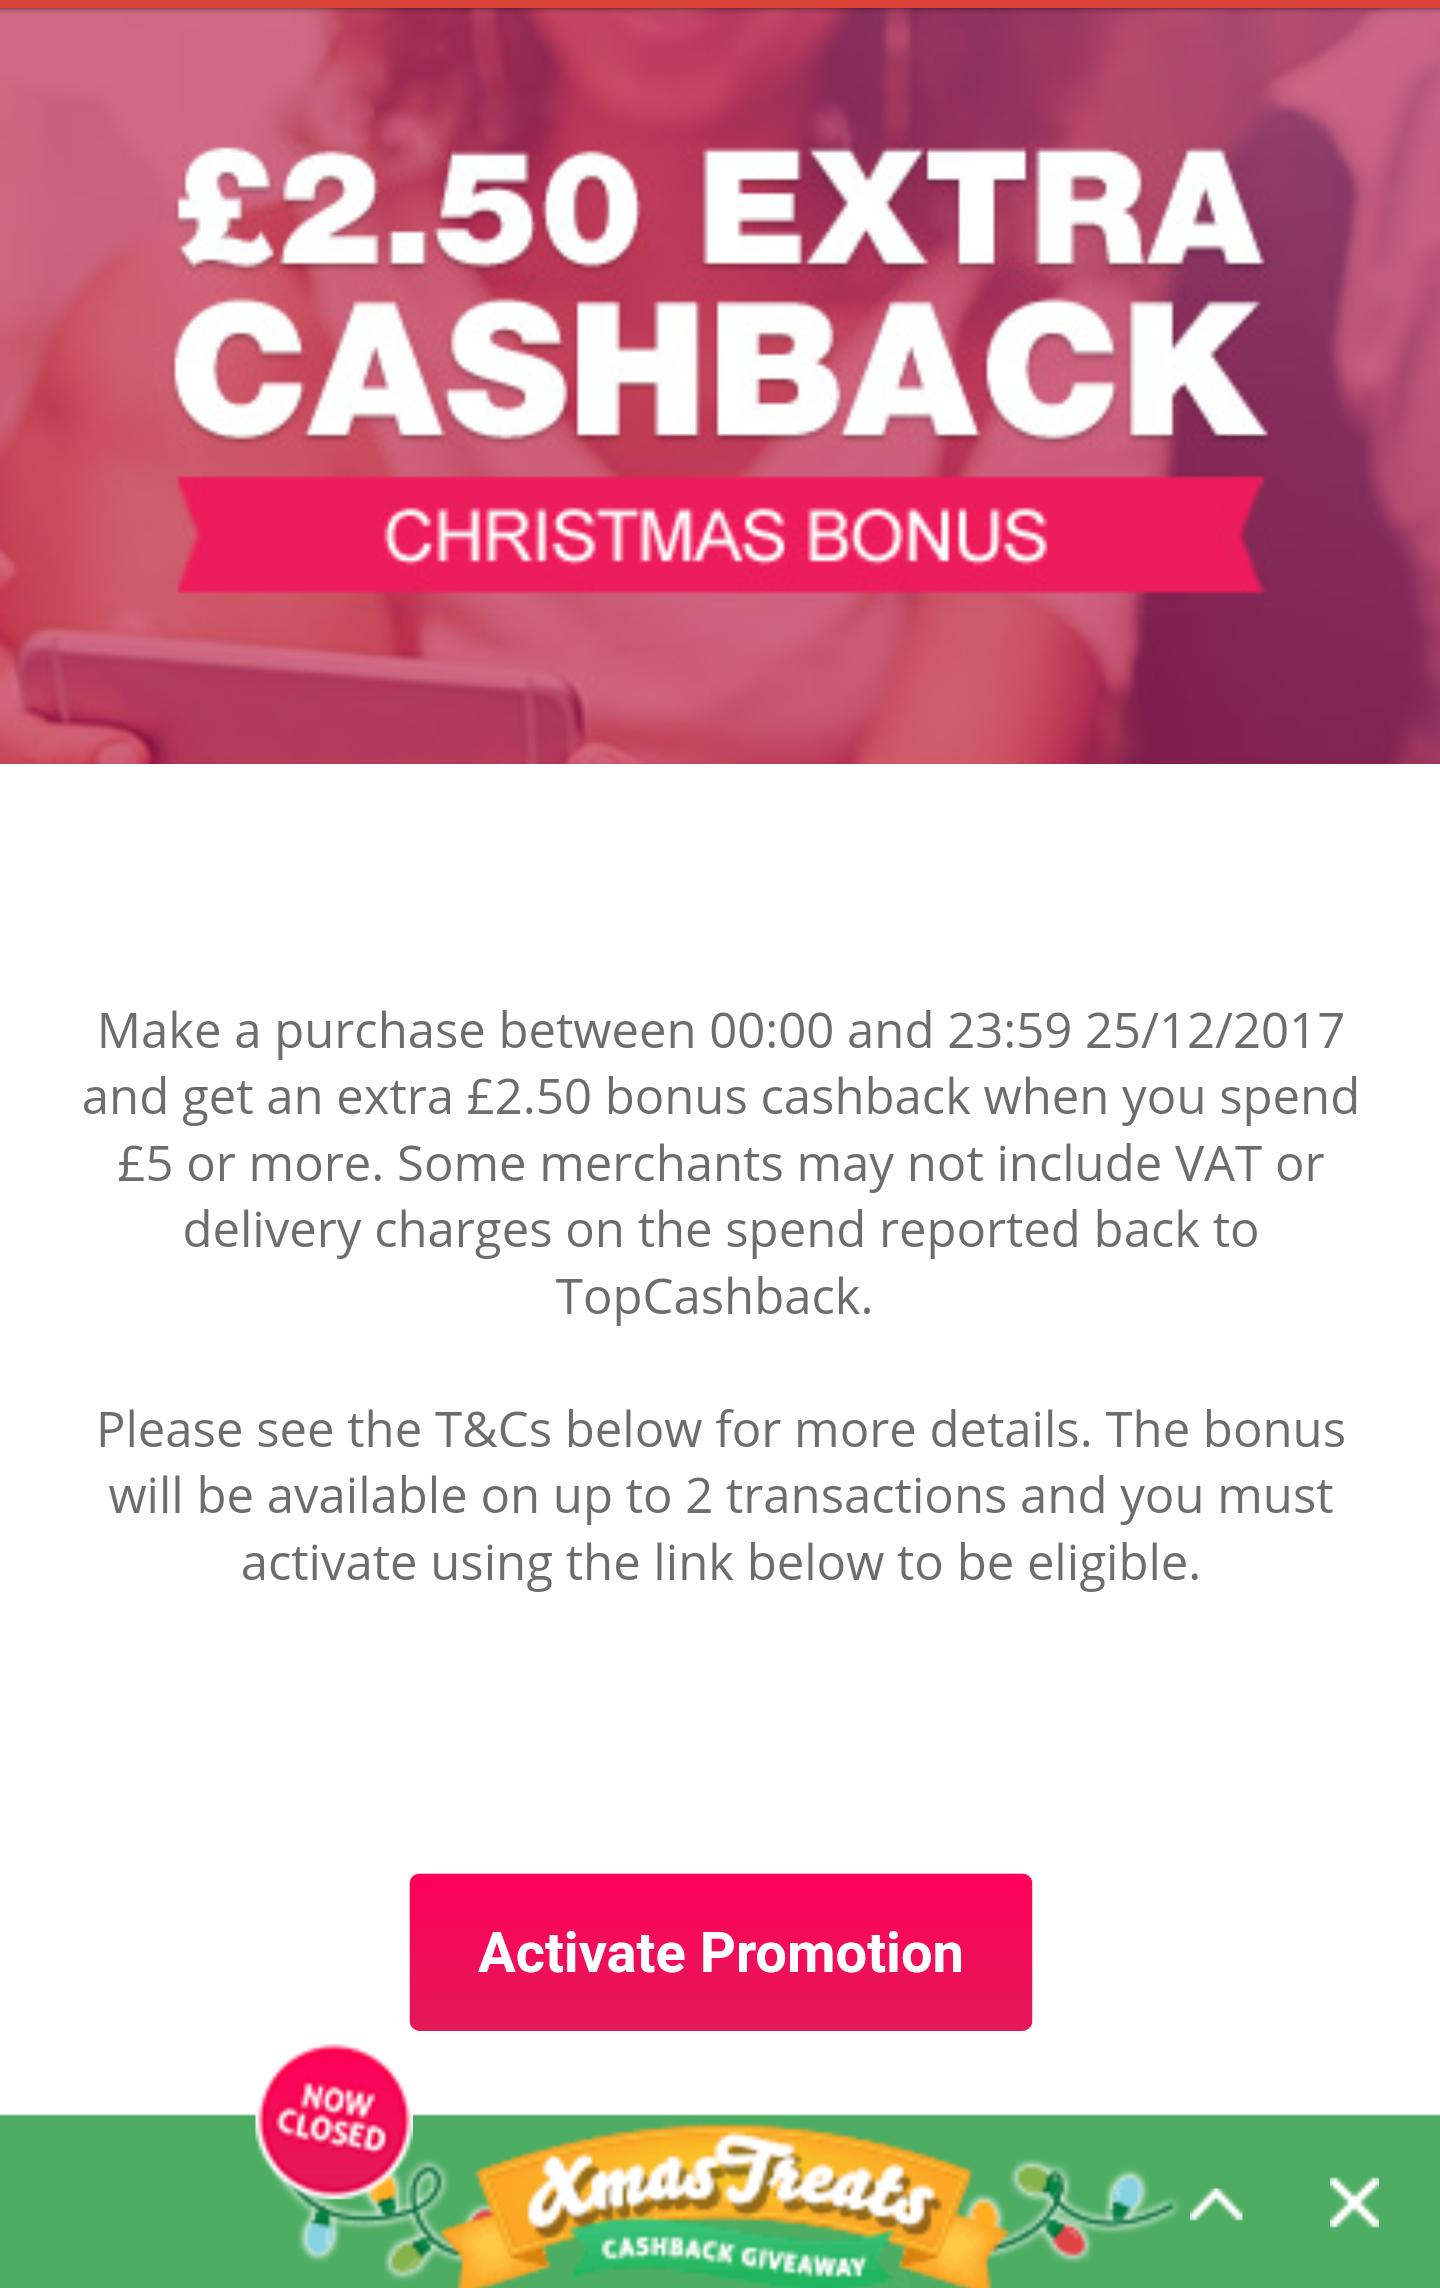 Topcashback £2.50 extra cashback bonus on order over £5